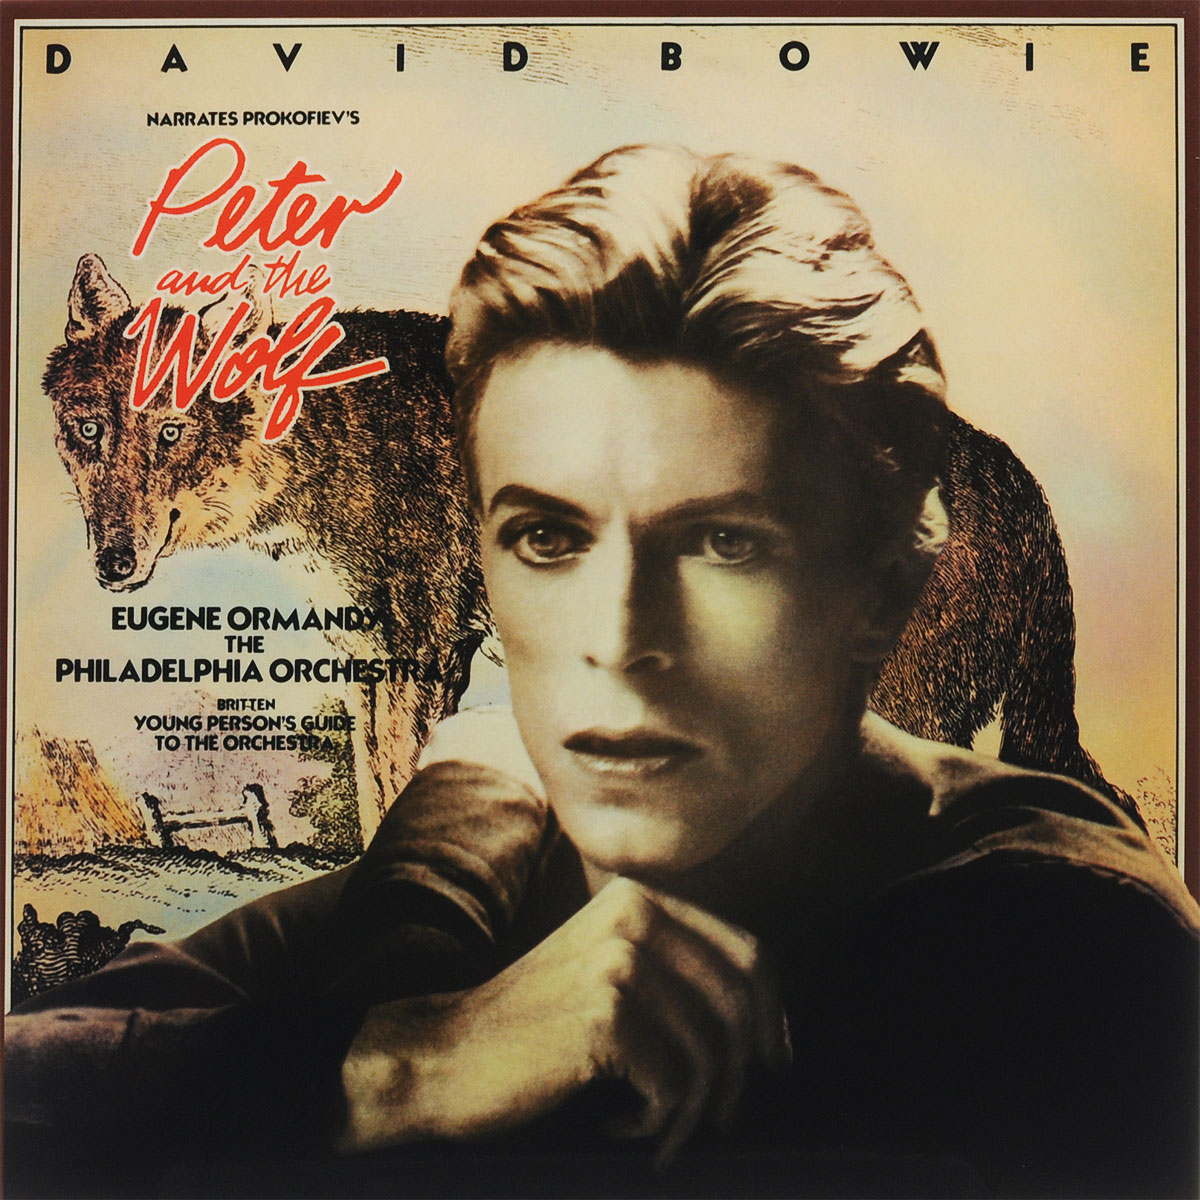 Дэвид Боуи,The Philadelphia Orchestra,Юджин Орманди David Bowie. Peter And The Wolf (LP) цена и фото